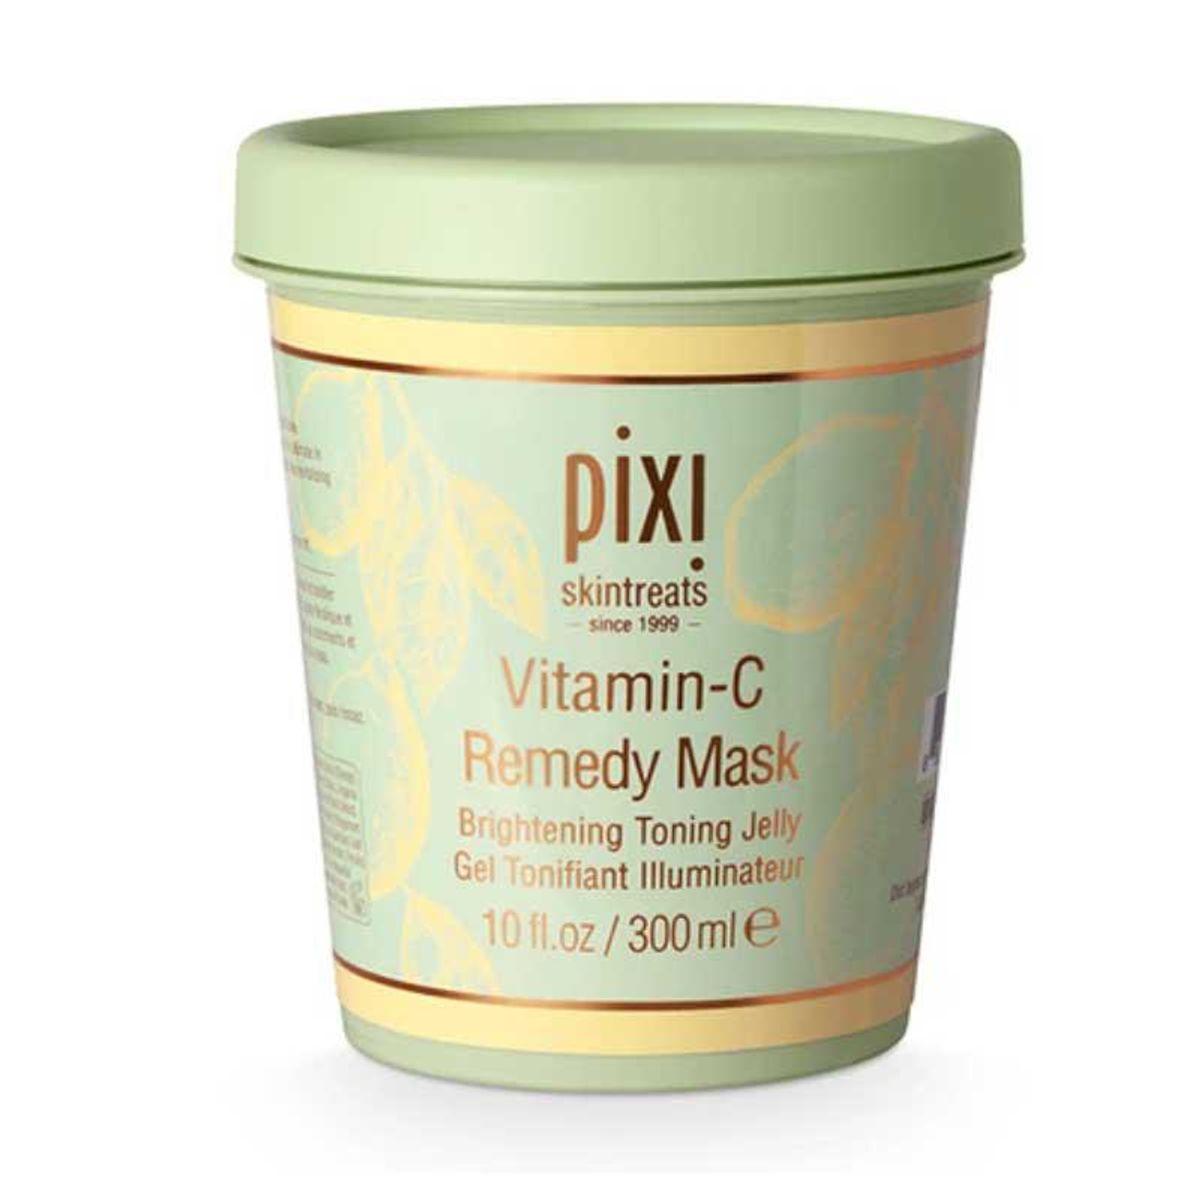 pixie vitamin-c remedy mask